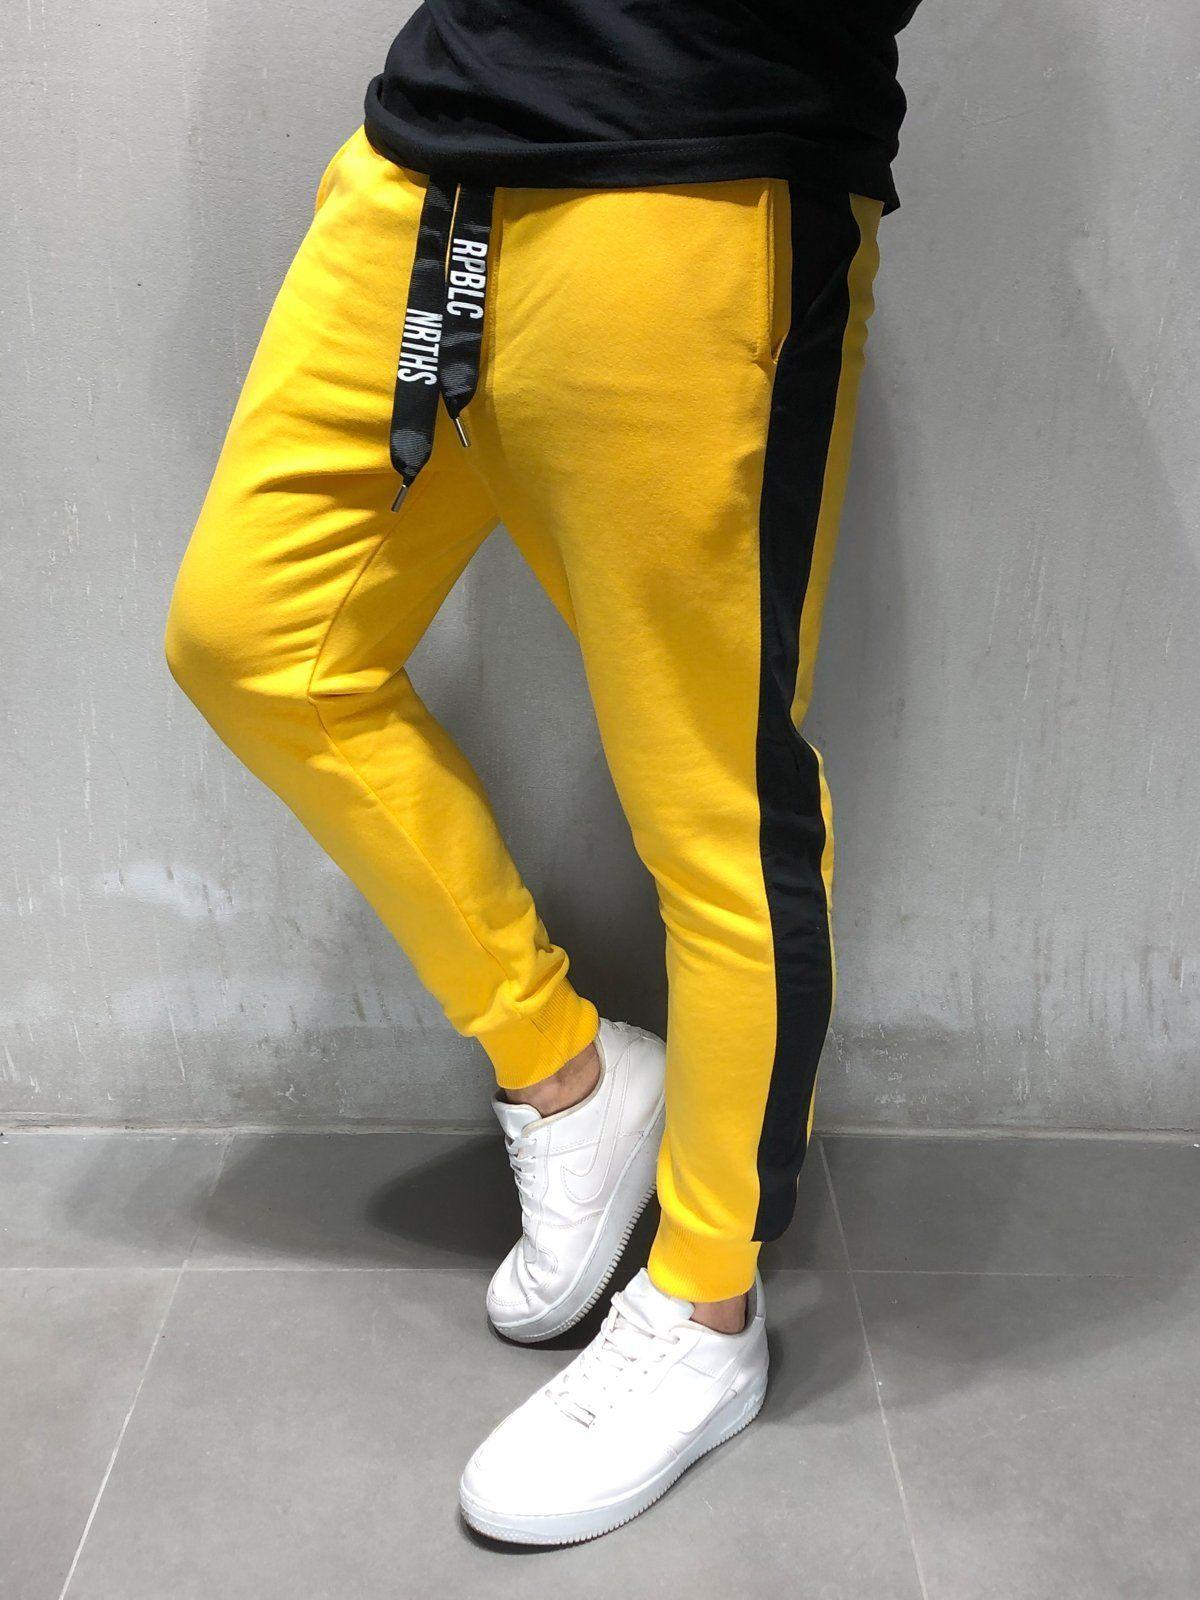 d130f9e7a13b Yellow Sweatpants Black Side Stripes Streetwear Jeans, Streetwear Fashion,  Mens Sweatpants, Joggers,